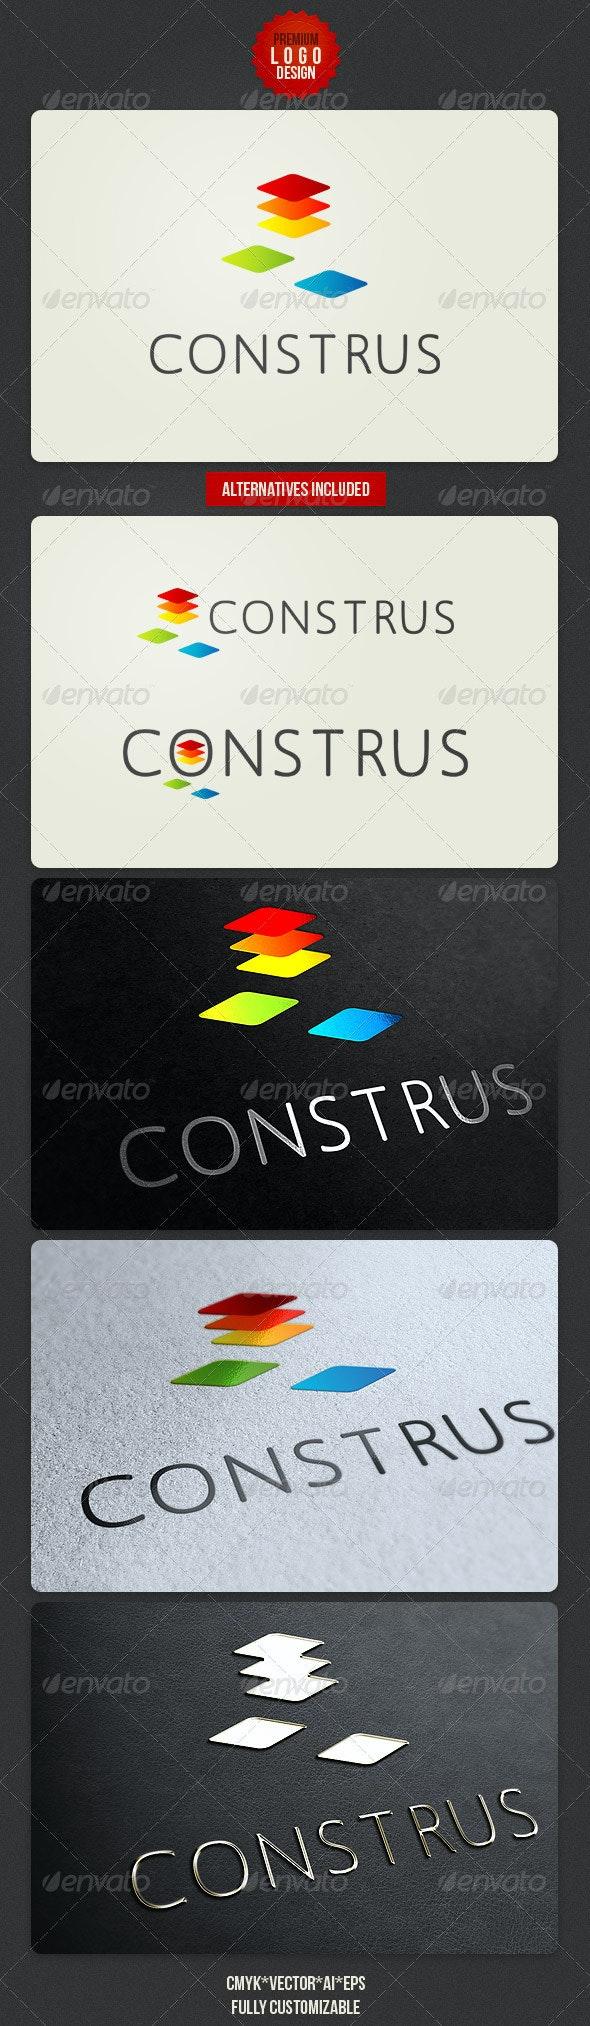 Construs Minimalistic Logo Design - Abstract Logo Templates